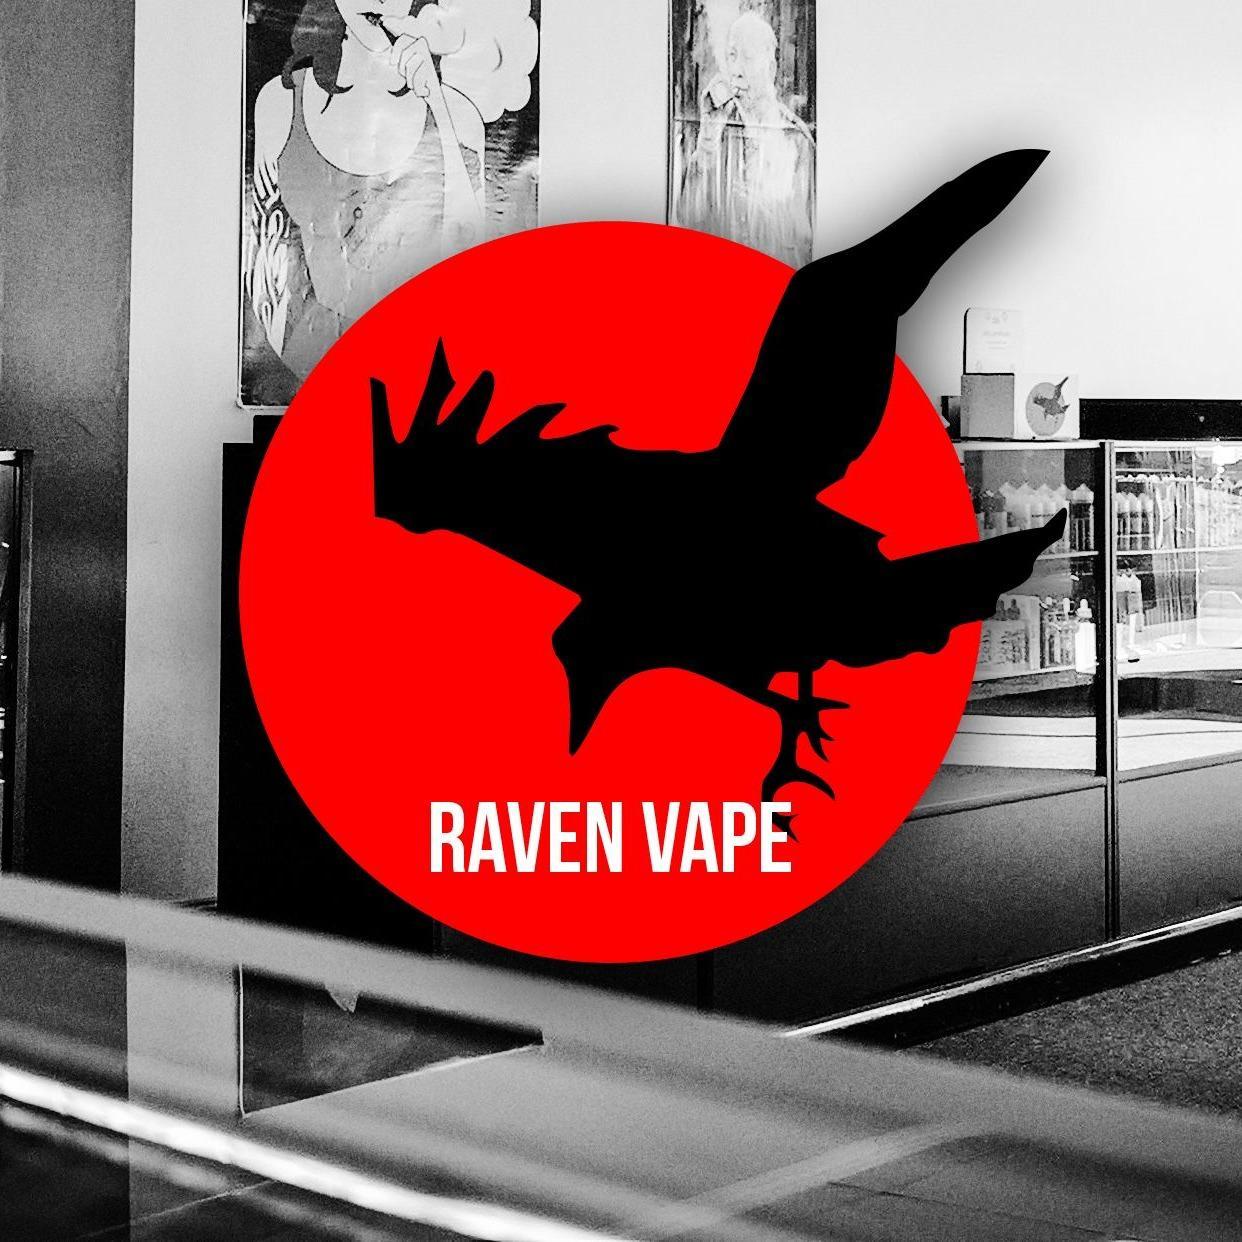 Raven Vapors